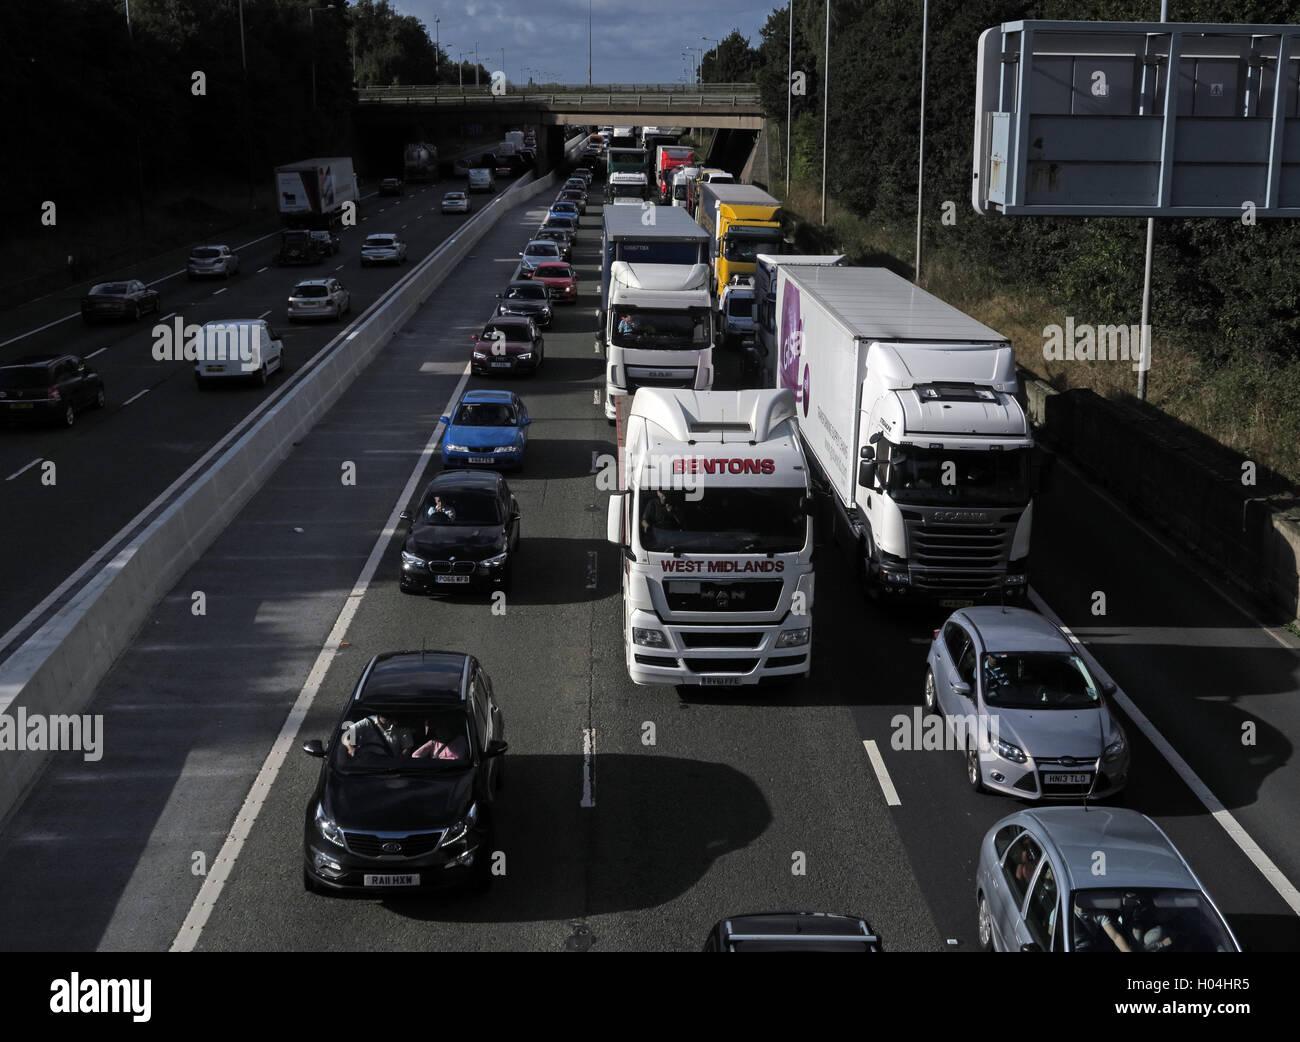 Traffic Congestion,Jams on the M6 Motorway,Warrington,Cheshire,England,UK - Stock Image